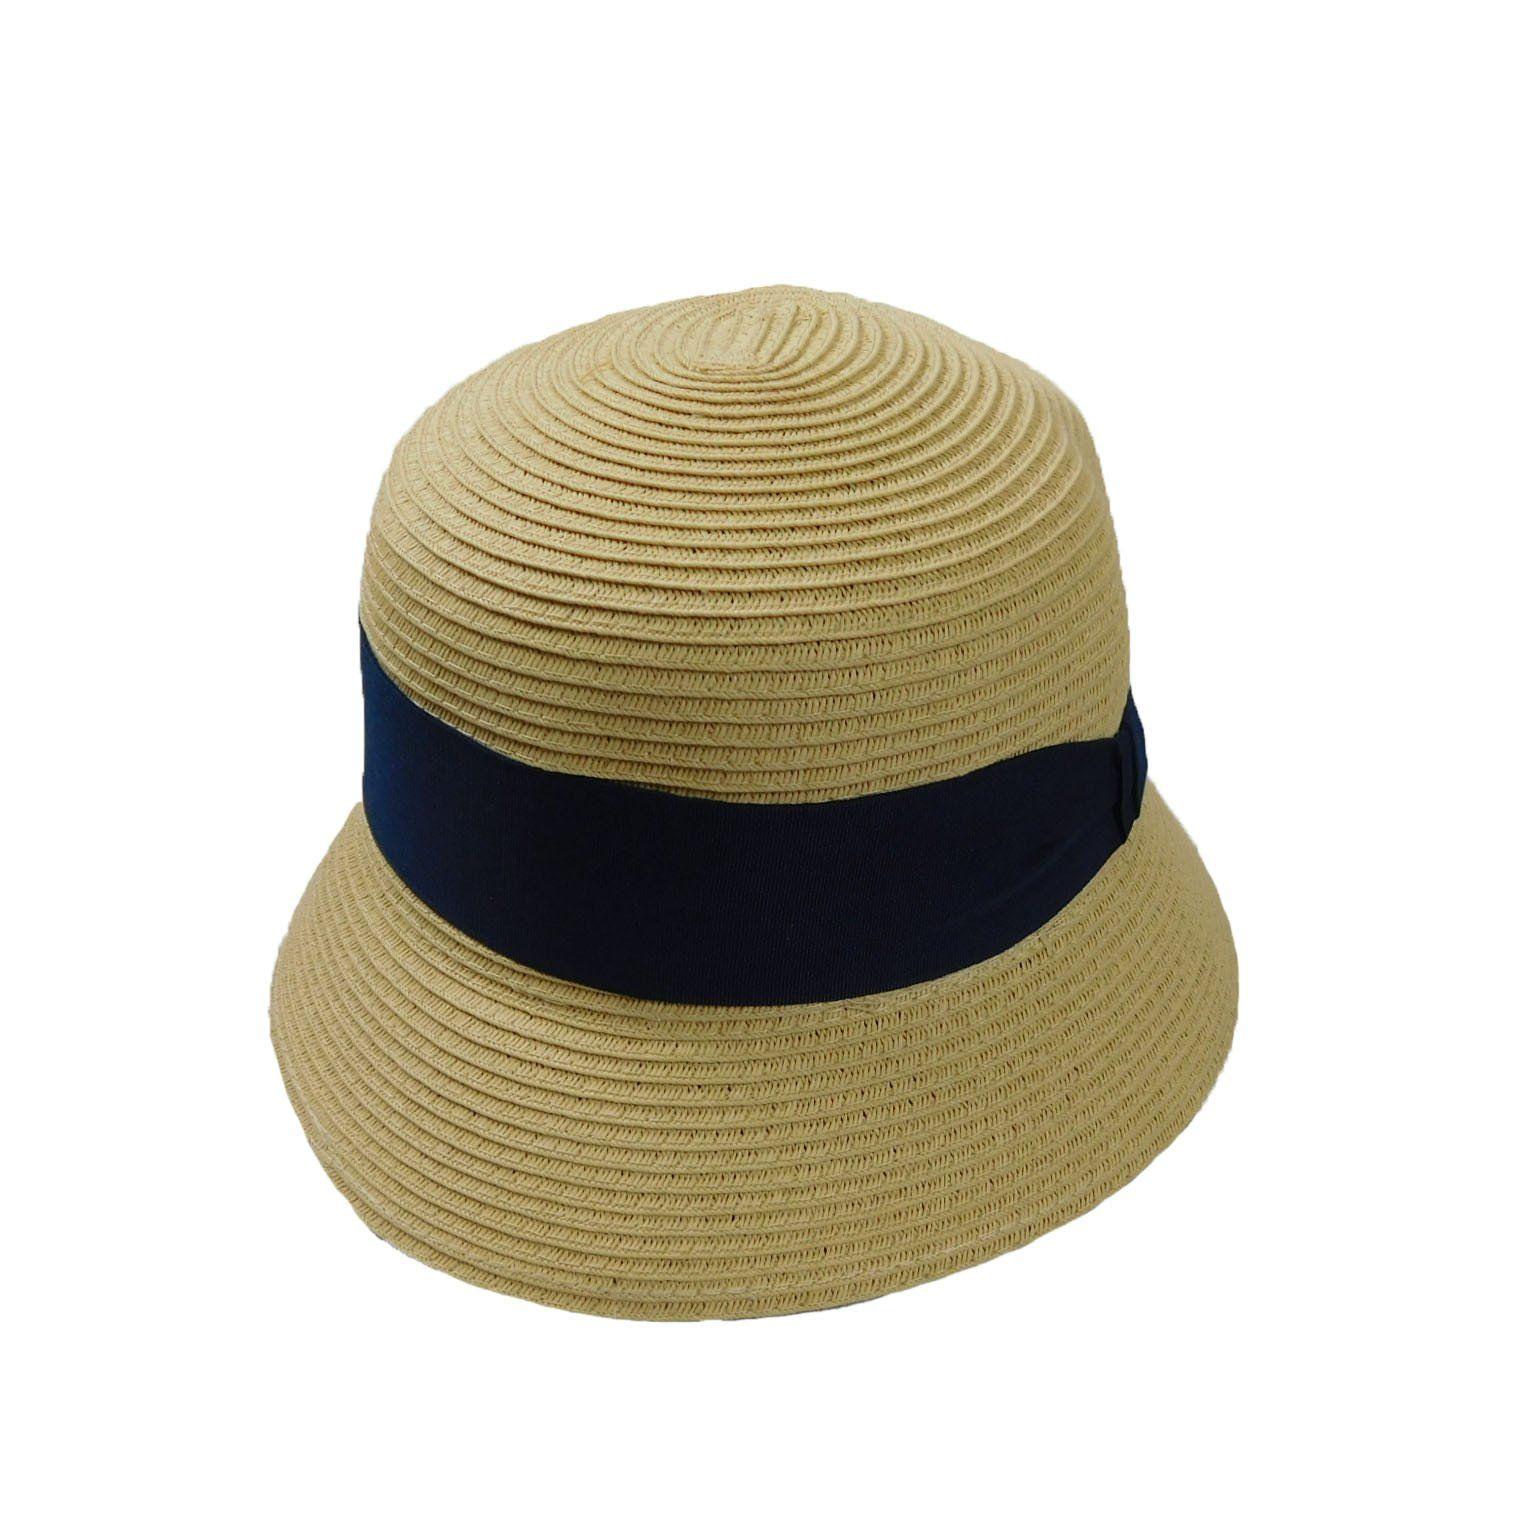 de18b70848f33 Tropical Trends Summer Floppy Hat